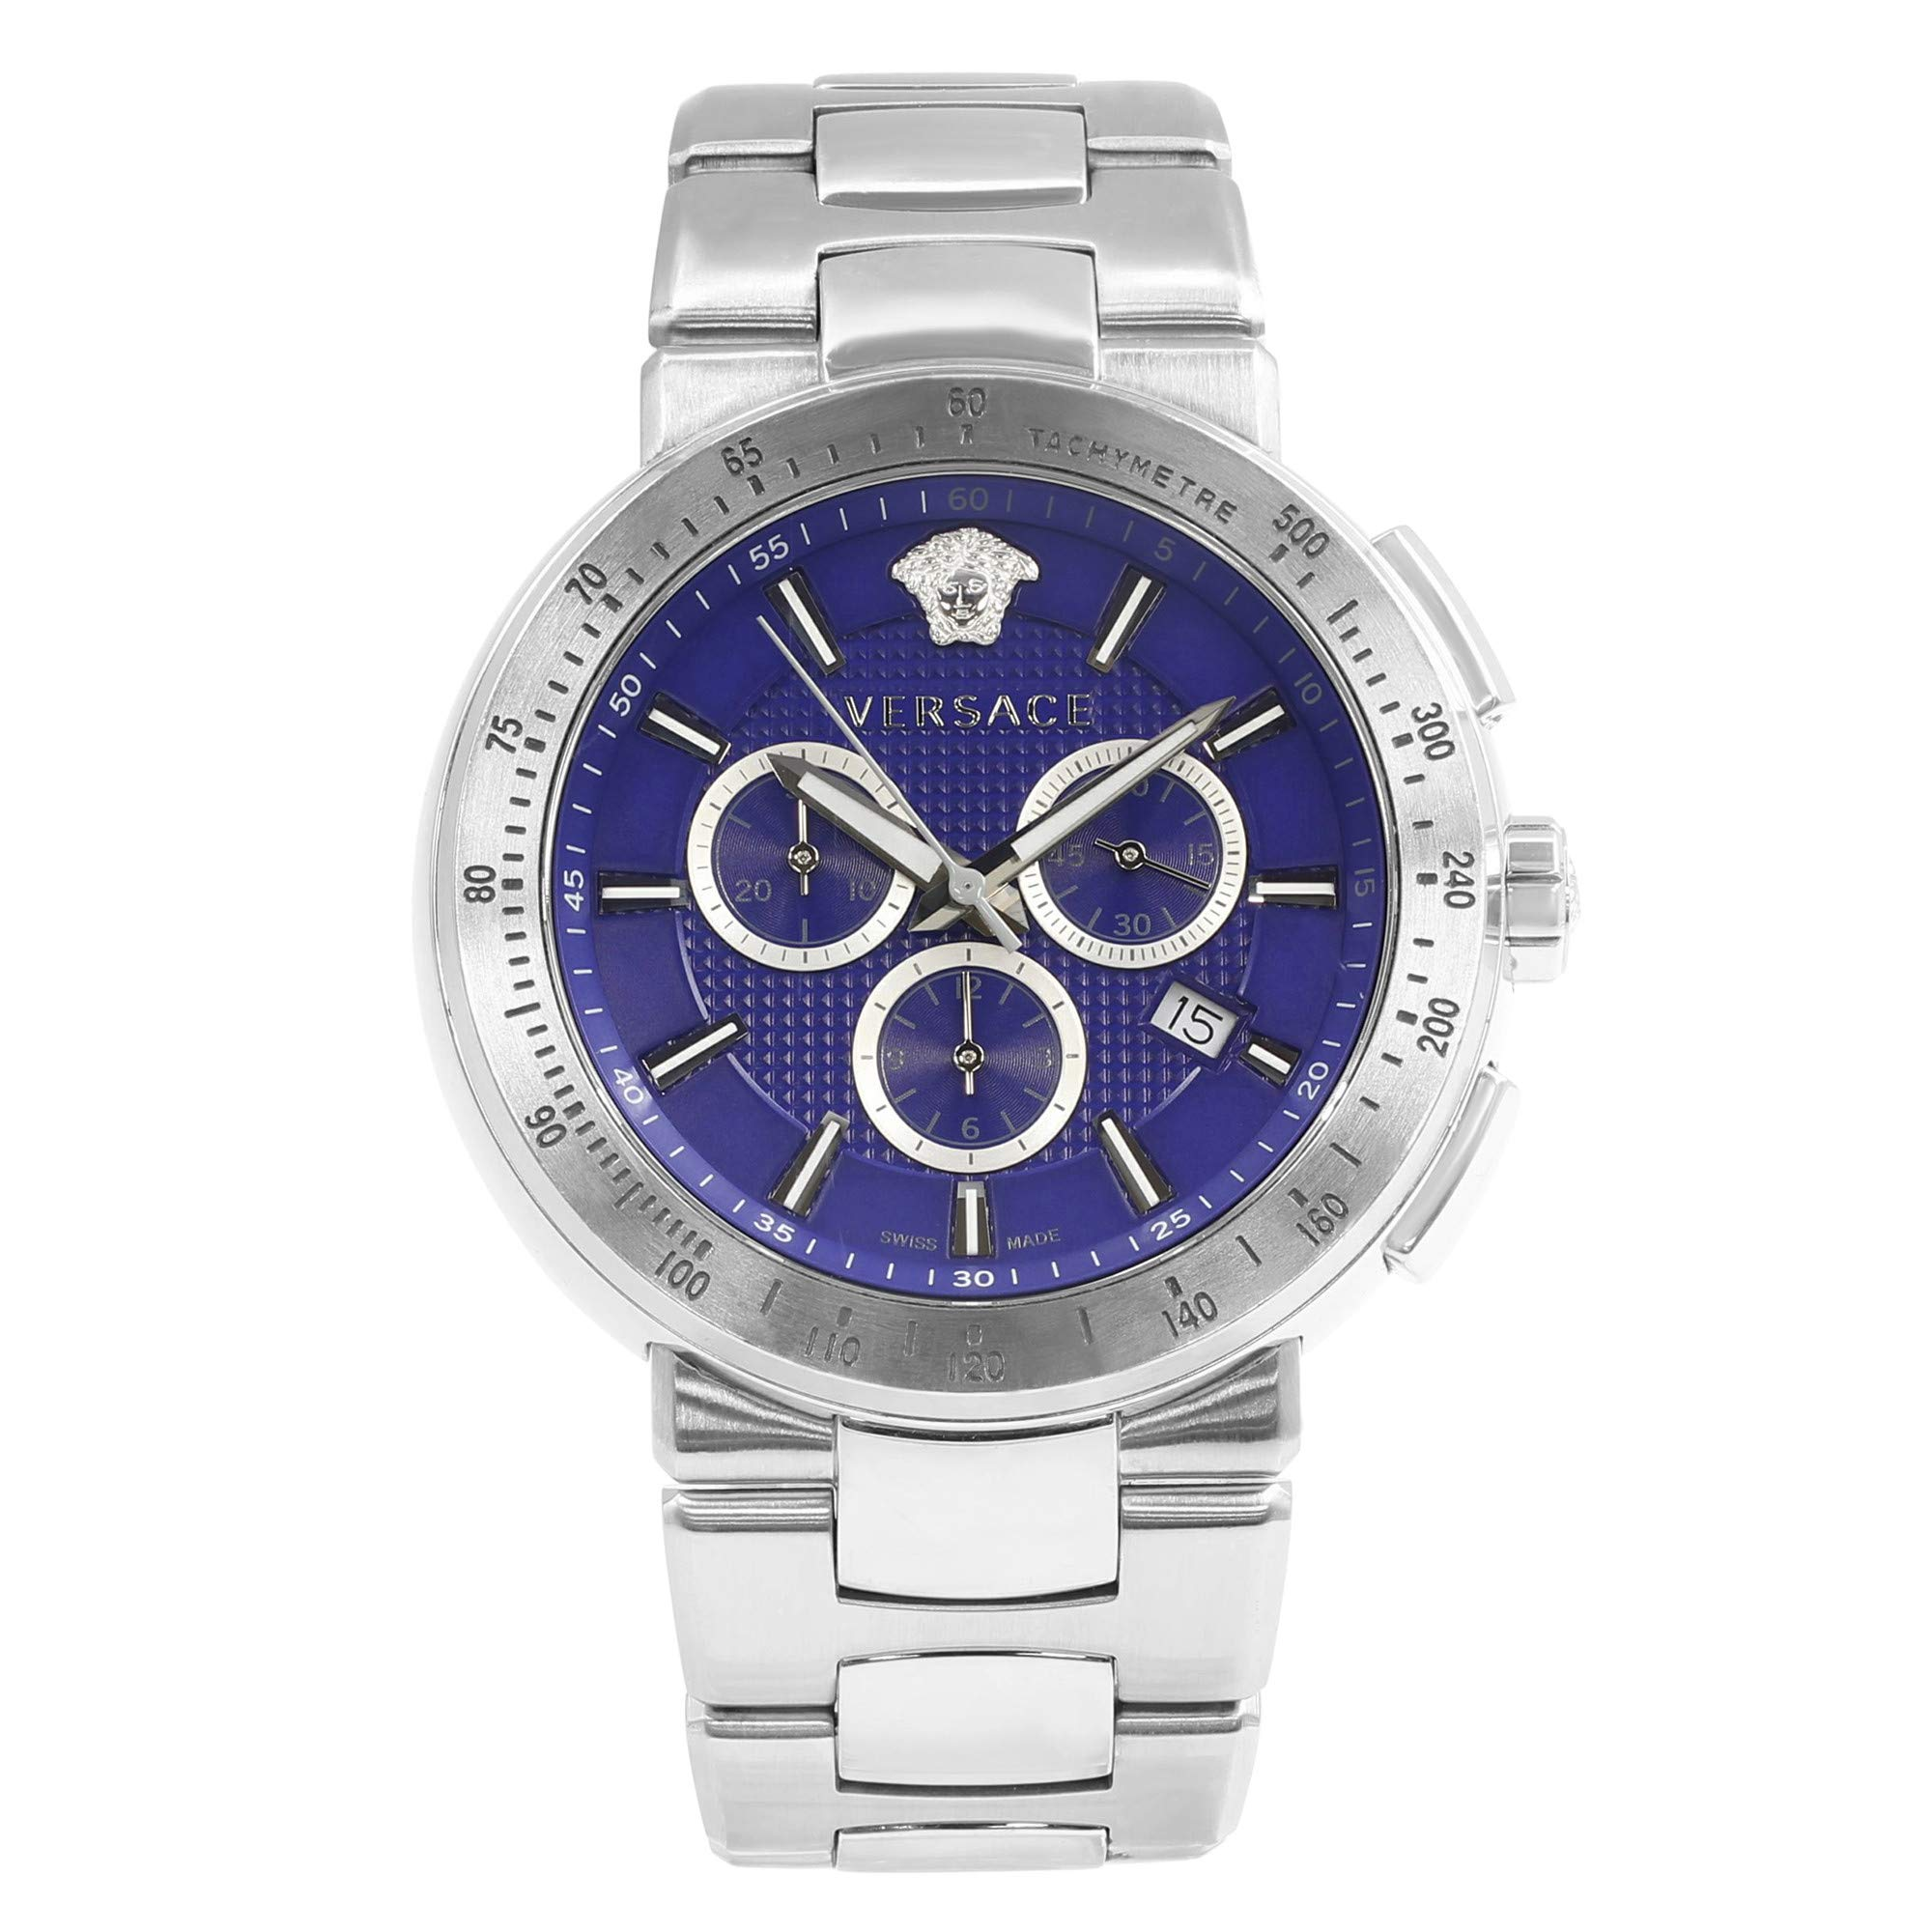 Versace Mystique Quartz Male Watch VFG120015 (Certified Pre-Owned)